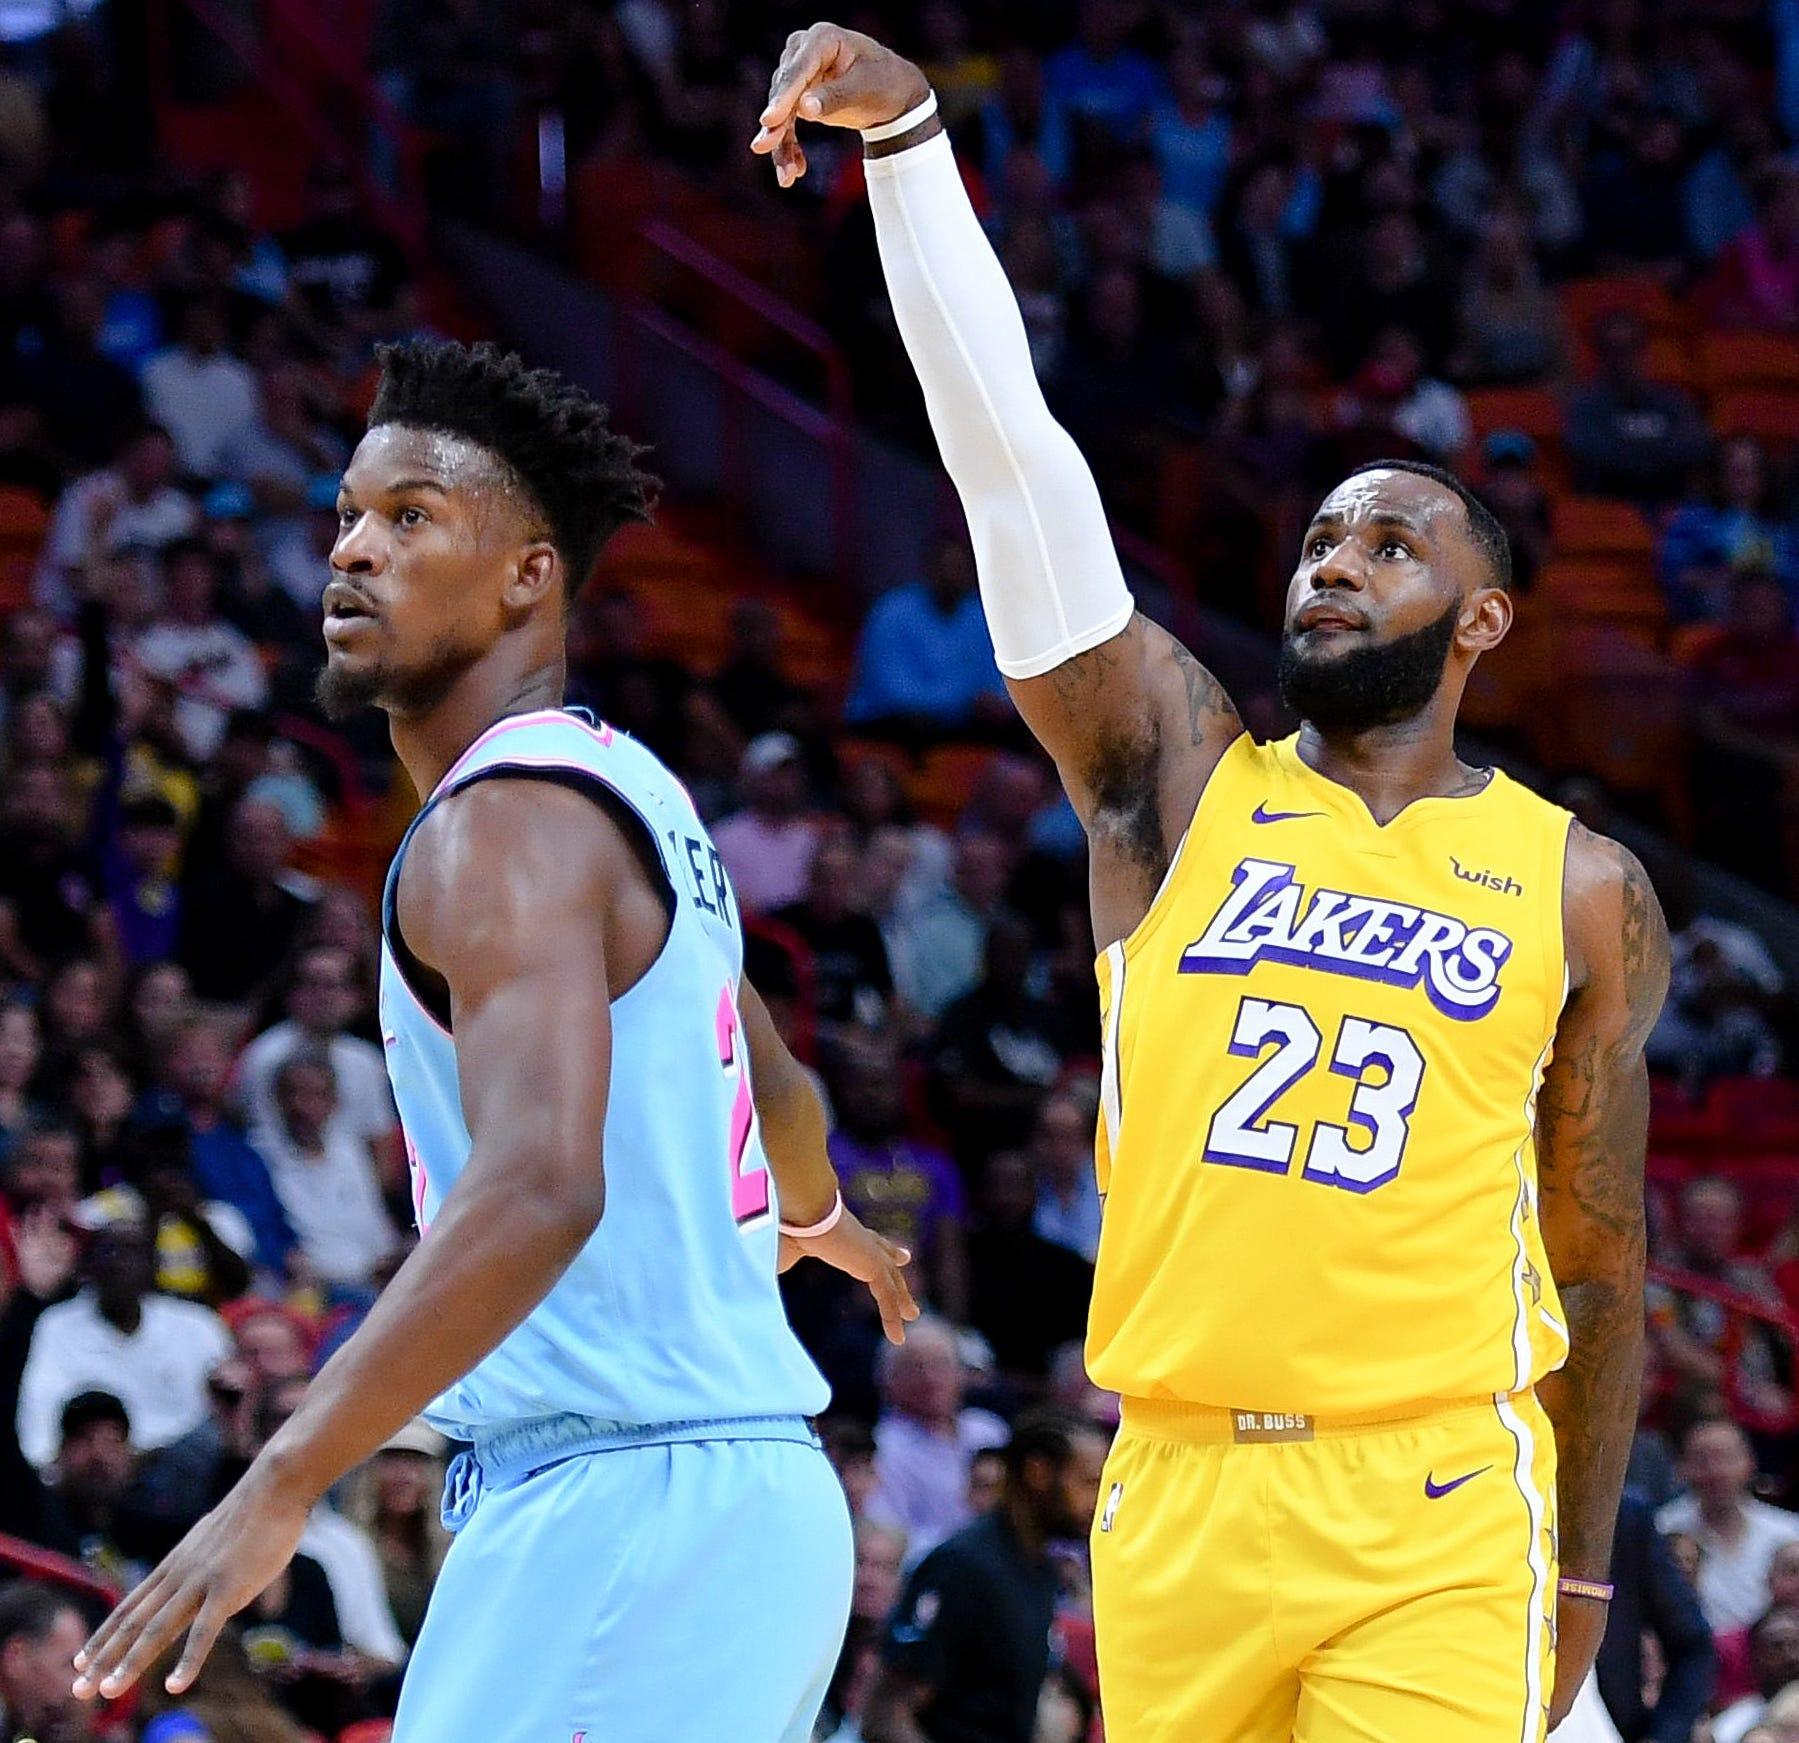 Lakers Vs Heat Picks Who Will Win Nba Championship